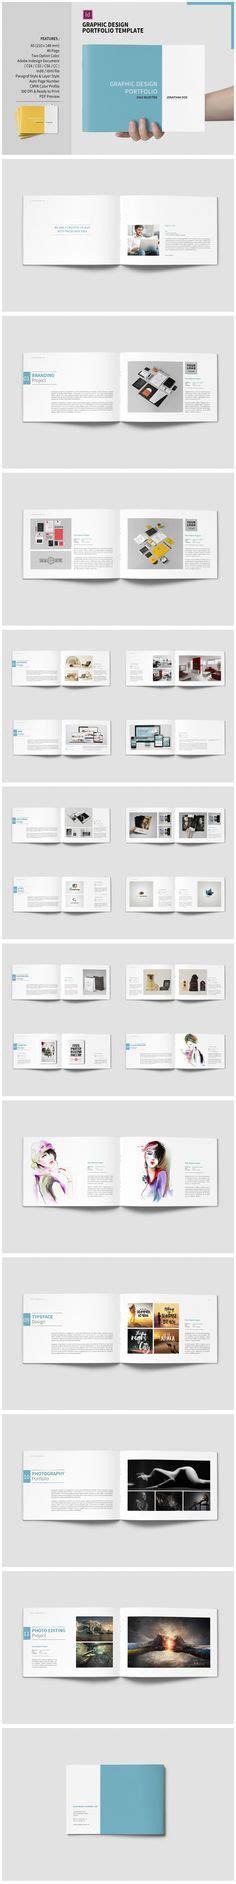 print portfolio template product design industrial design 제품디자인 산업디자인